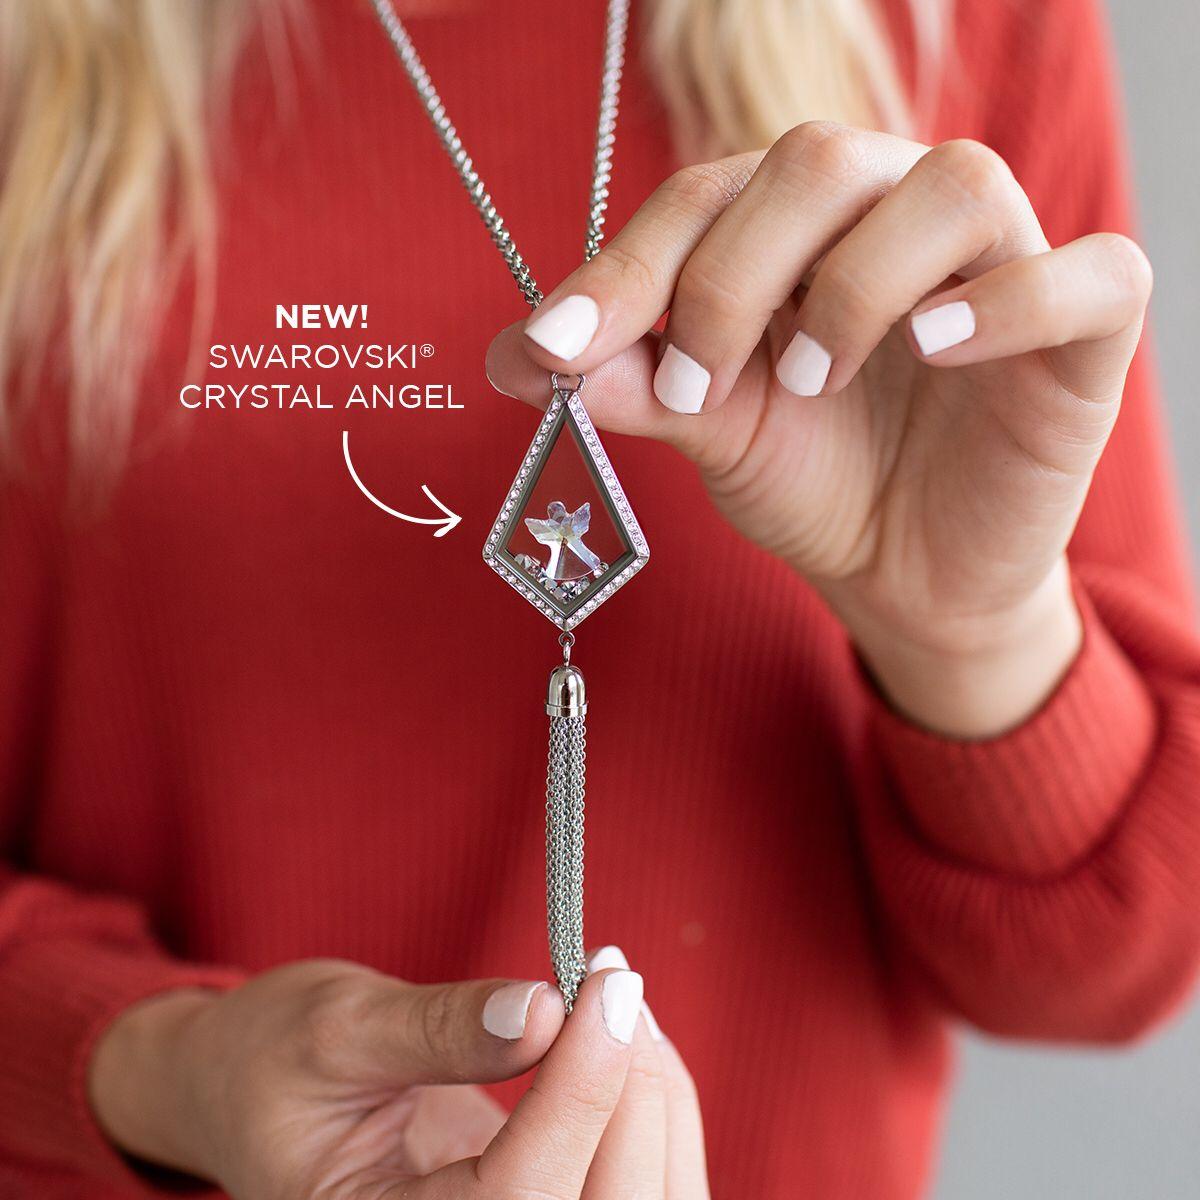 Am Exclusive Swarovski Locket Figurine From Origami Owl This Christmas Season Jewelry Angels Cr Origami Owl Jewelry Origami Owl Charms Origami Owl Designer